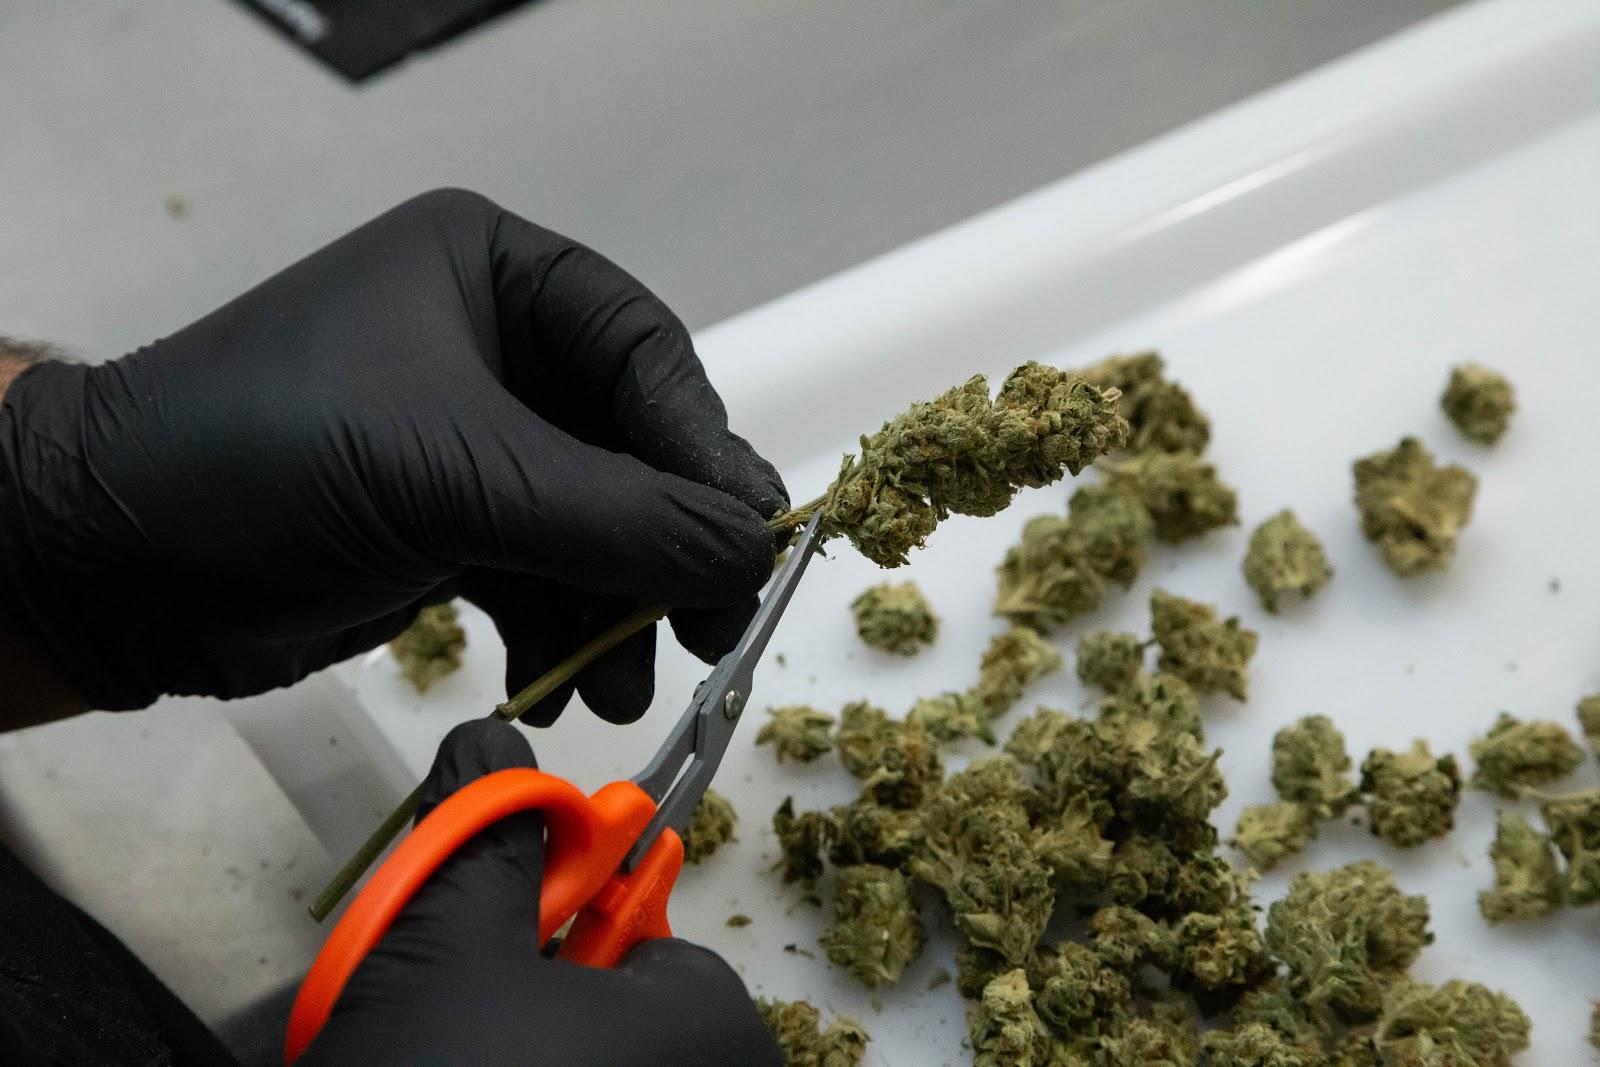 2019_02_06_Trimming_Stems_Cultivation_Flowering_Harmony_Dispensary_Cannabis_Marijuana_07.jpg